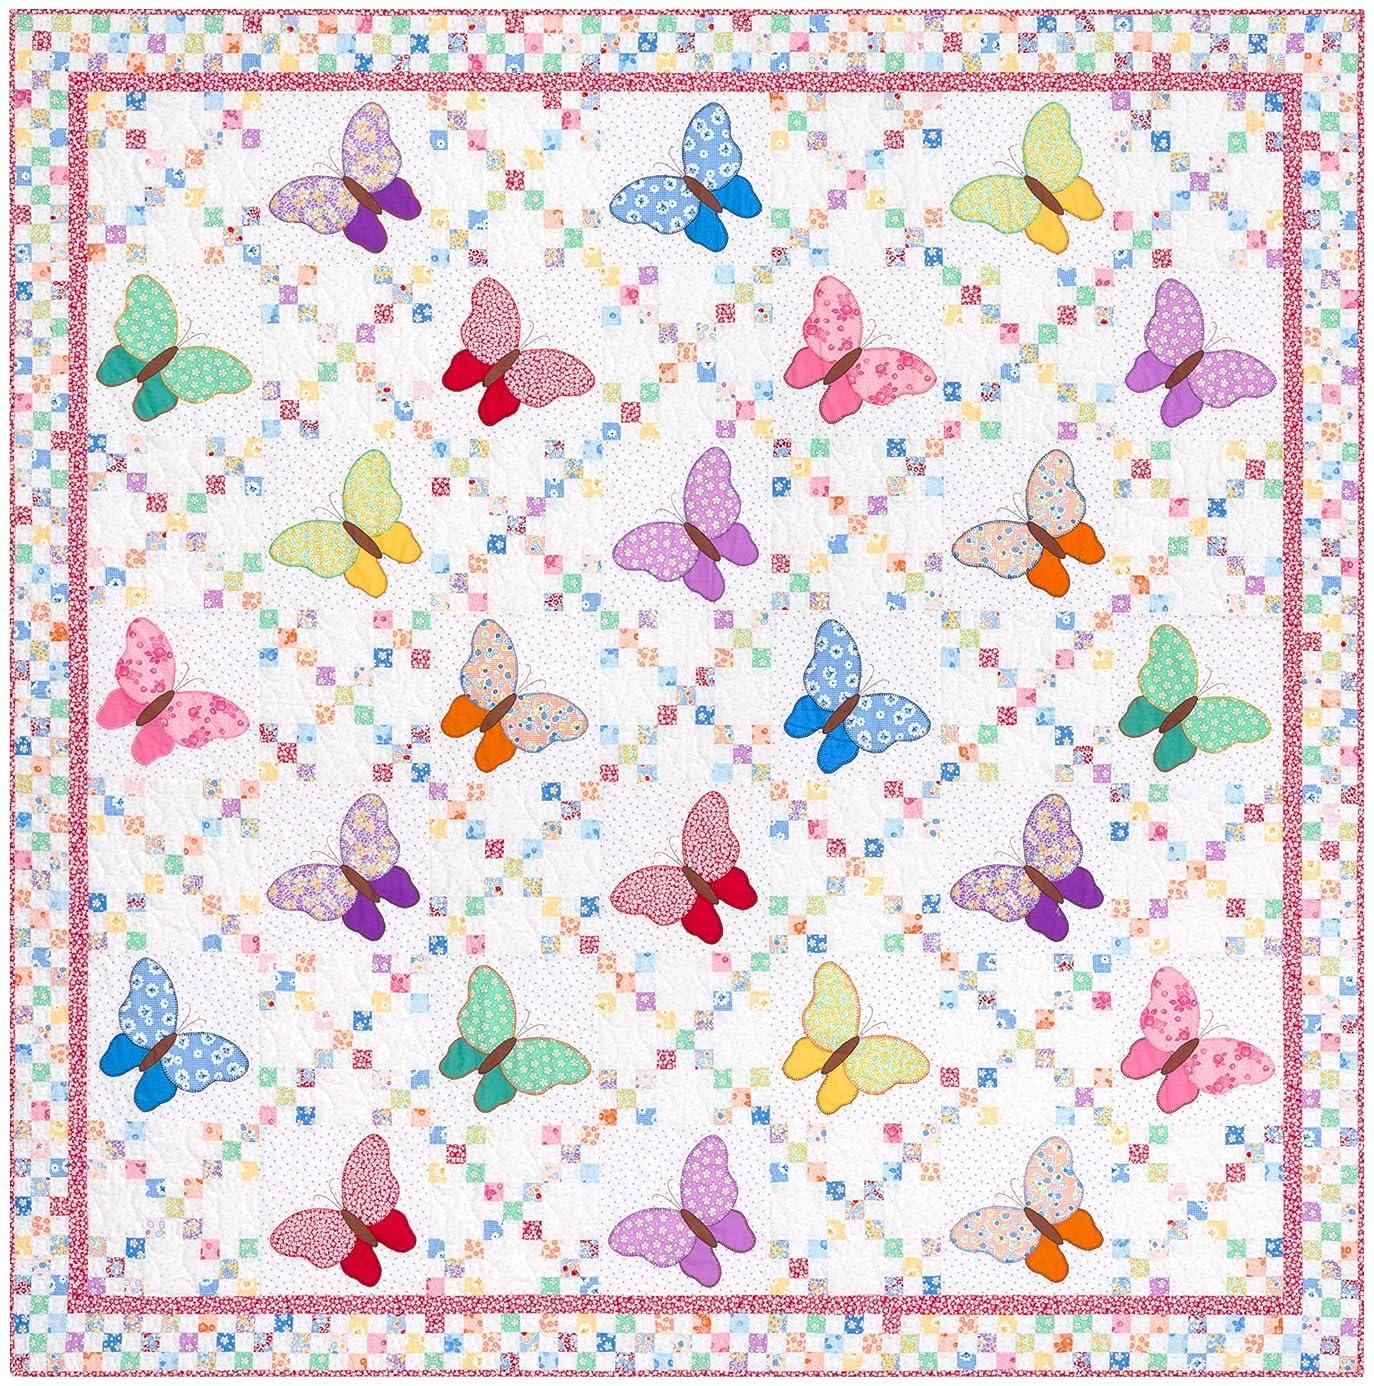 Darlene Zimmerman Aunt Ella's Butterflies Quilt Kit Robert Kaufman Fabrics KITP-1901-22 xqu6952421